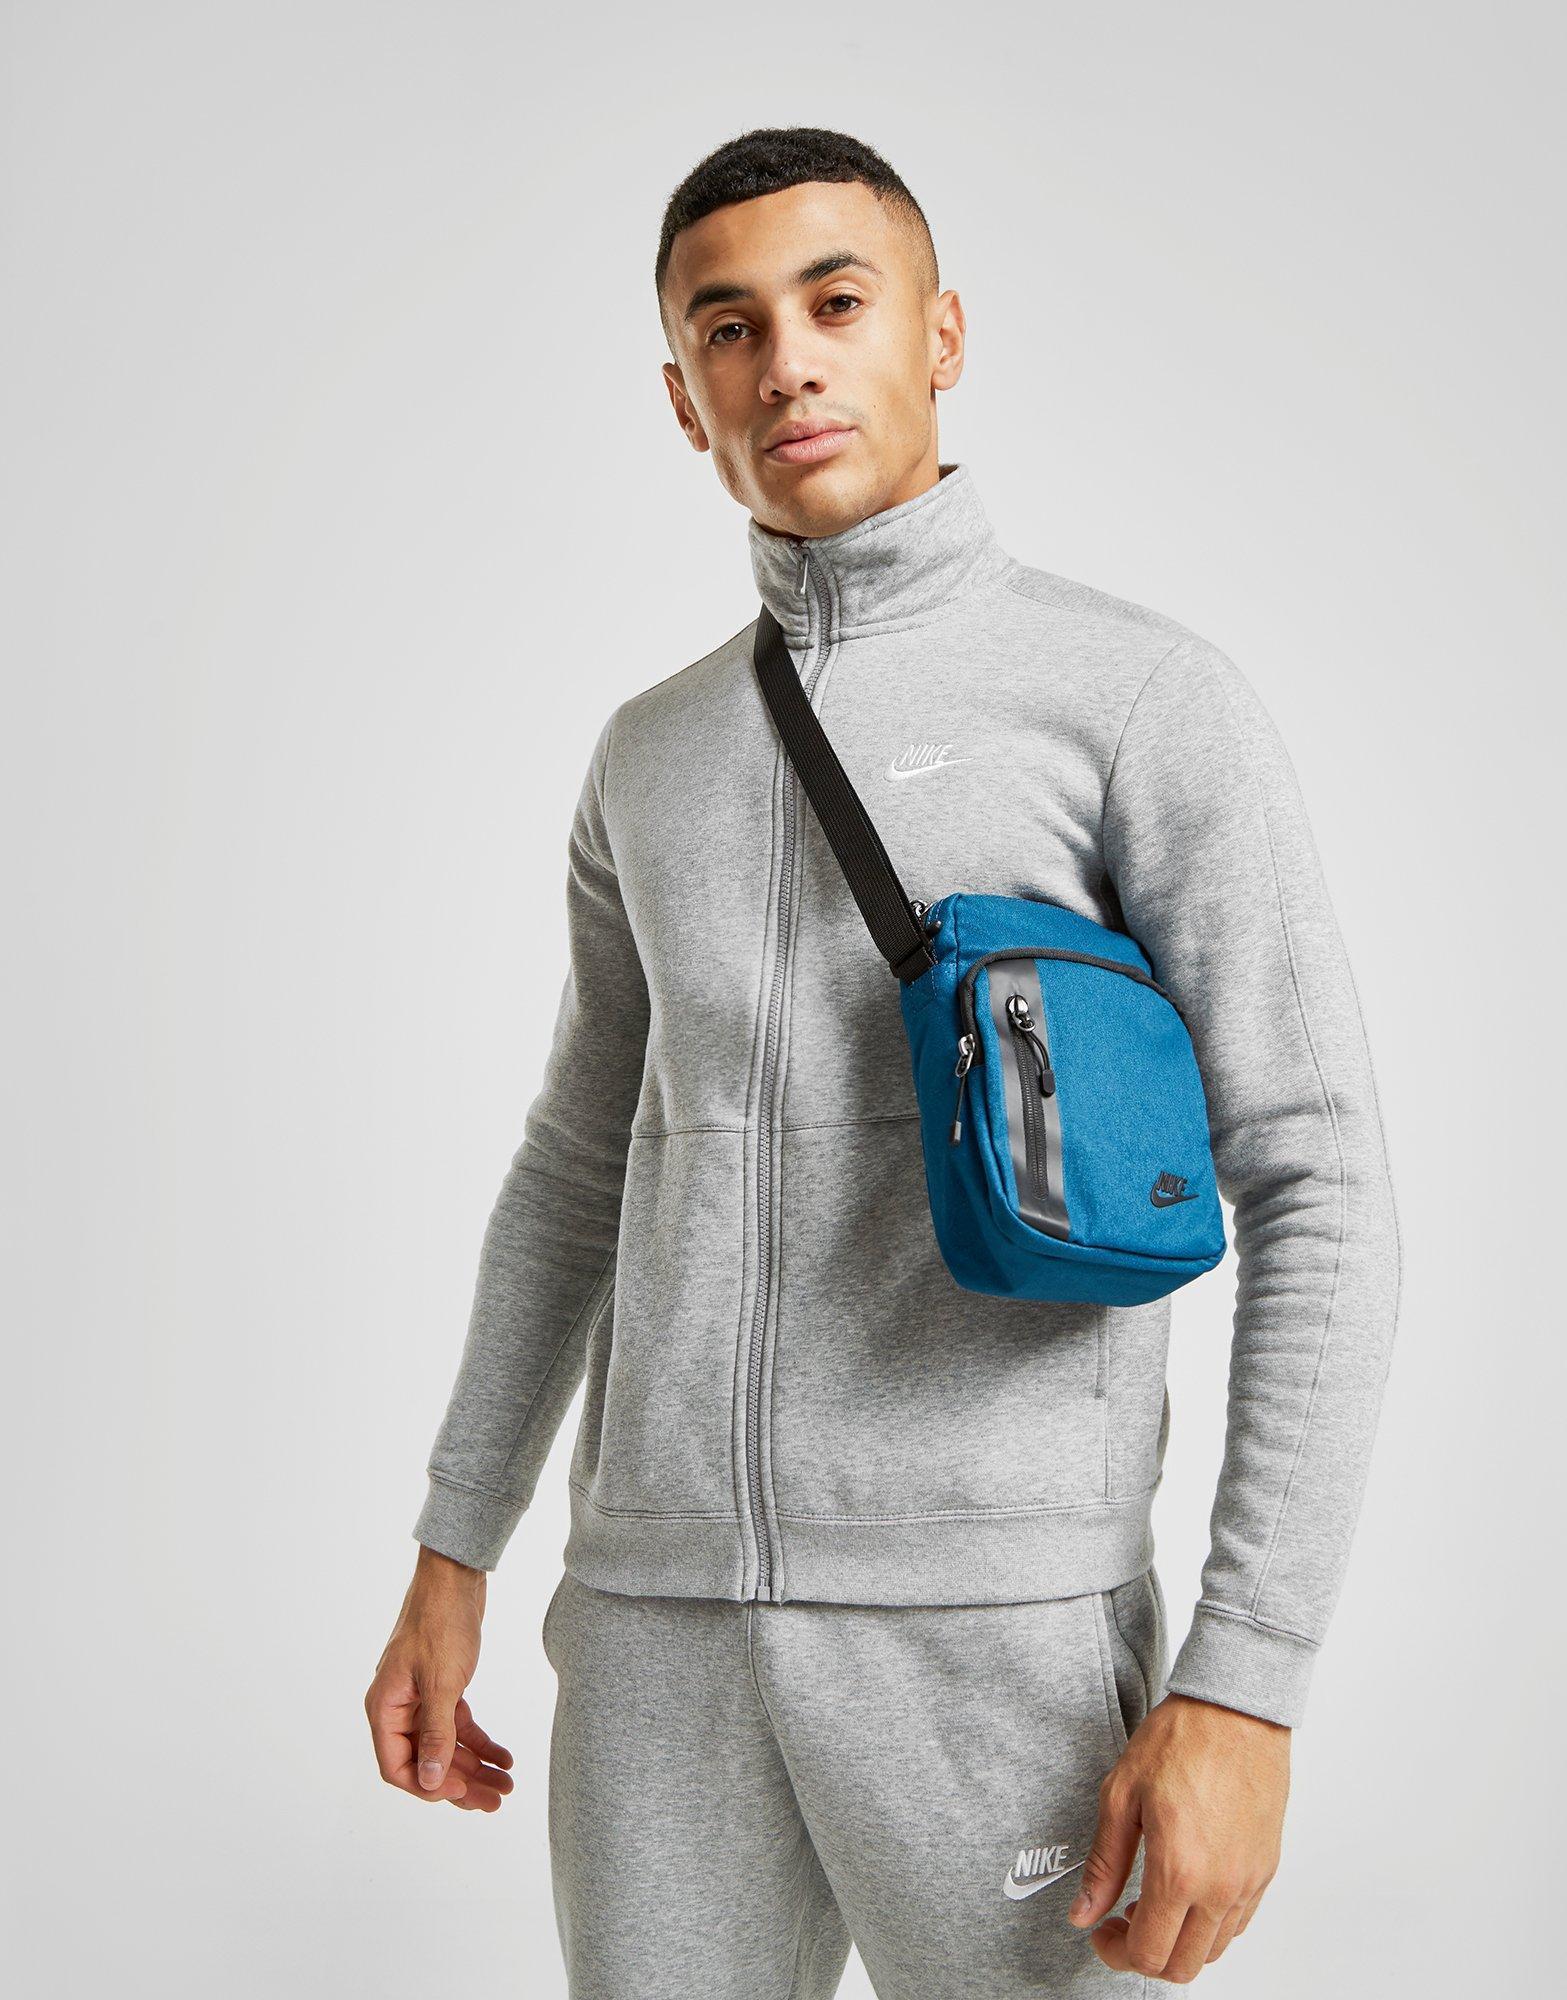 inversión máximo parcialidad  Nike Synthetic Core Small Crossbody Bag in Blue/Black (Blue) for Men - Lyst